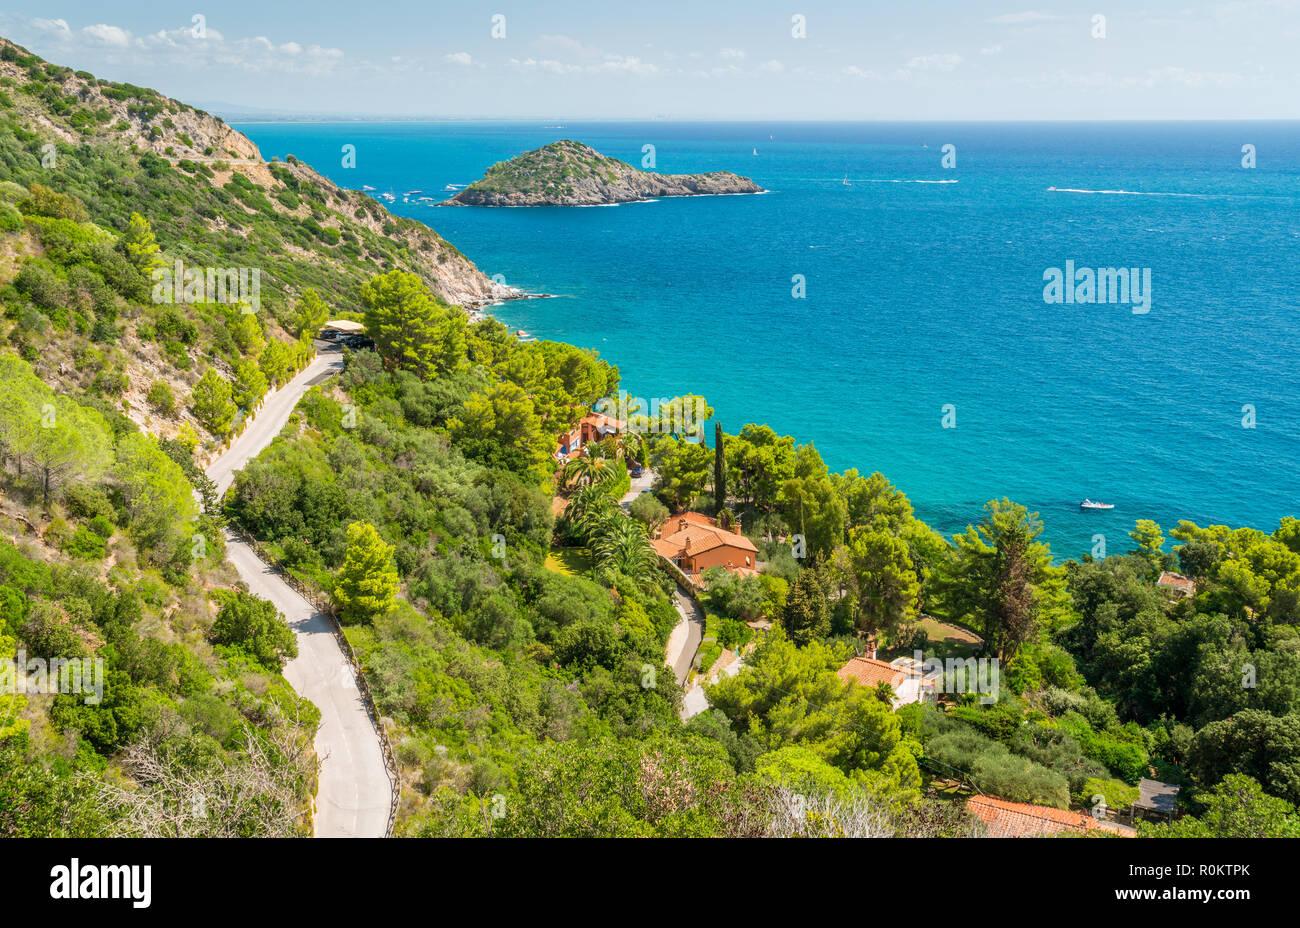 A sunny summer landscape near Porto Ercole, in Monte Argentario, in the Tuscany region of Italy. - Stock Image